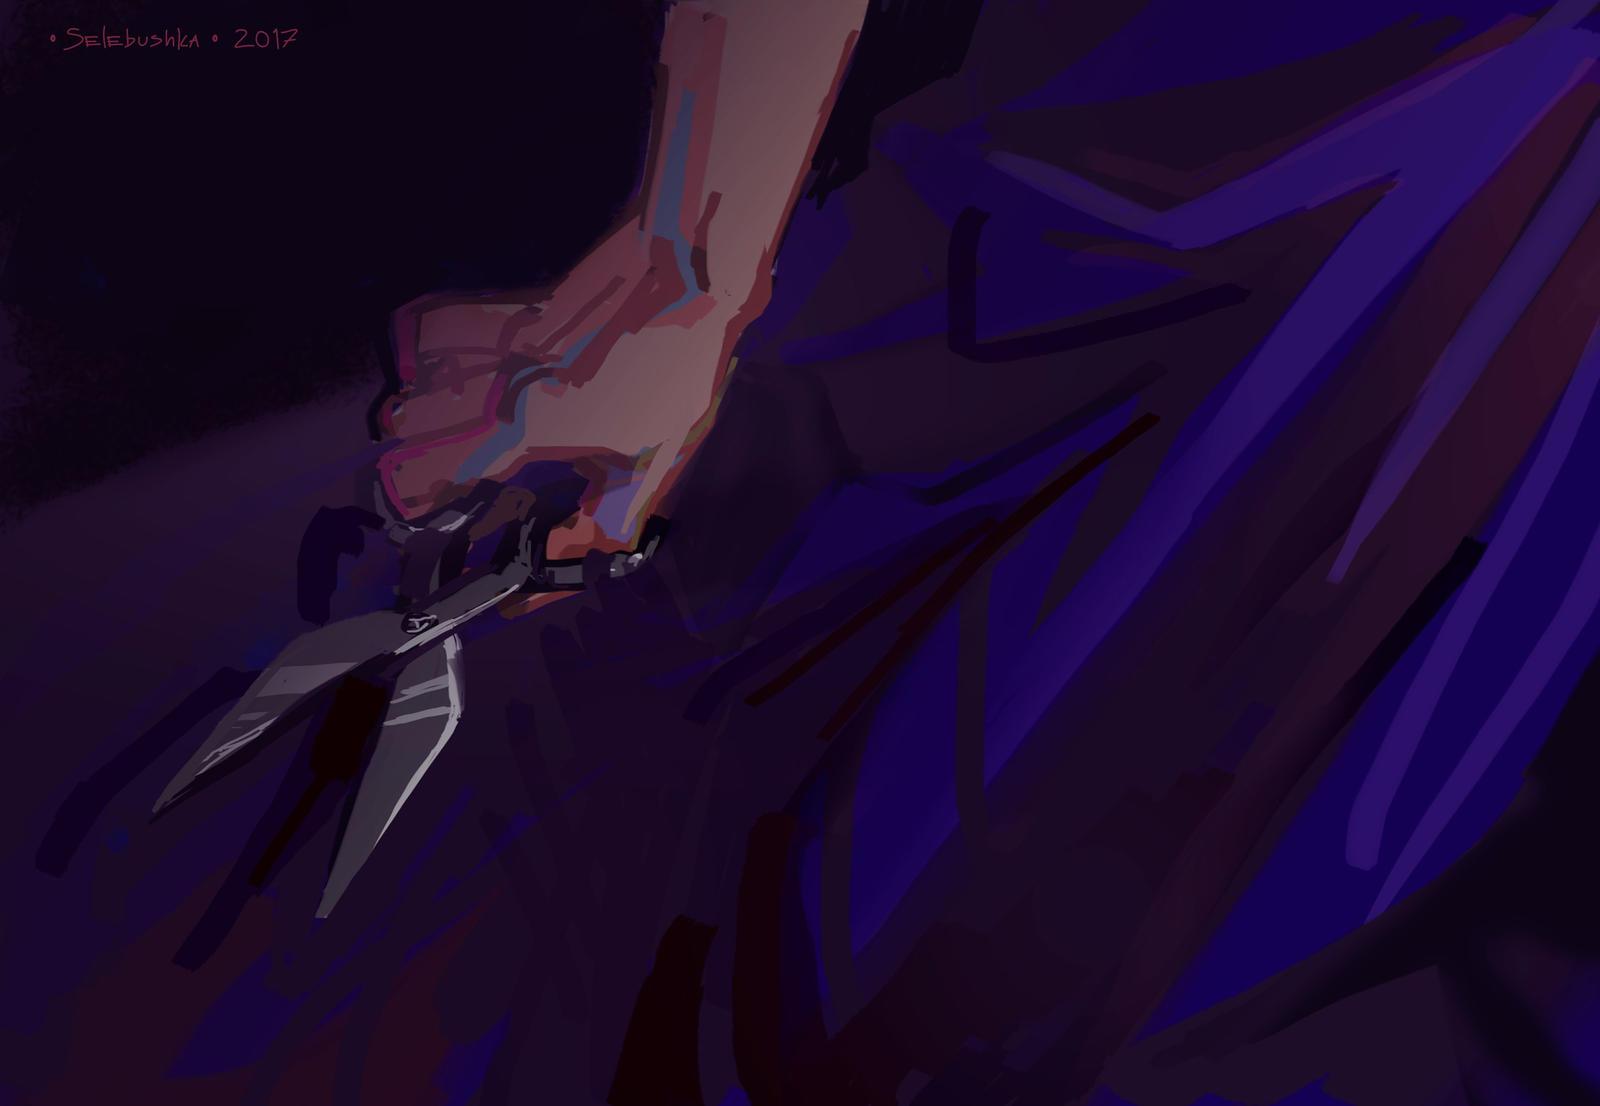 Scissors by Selebushka